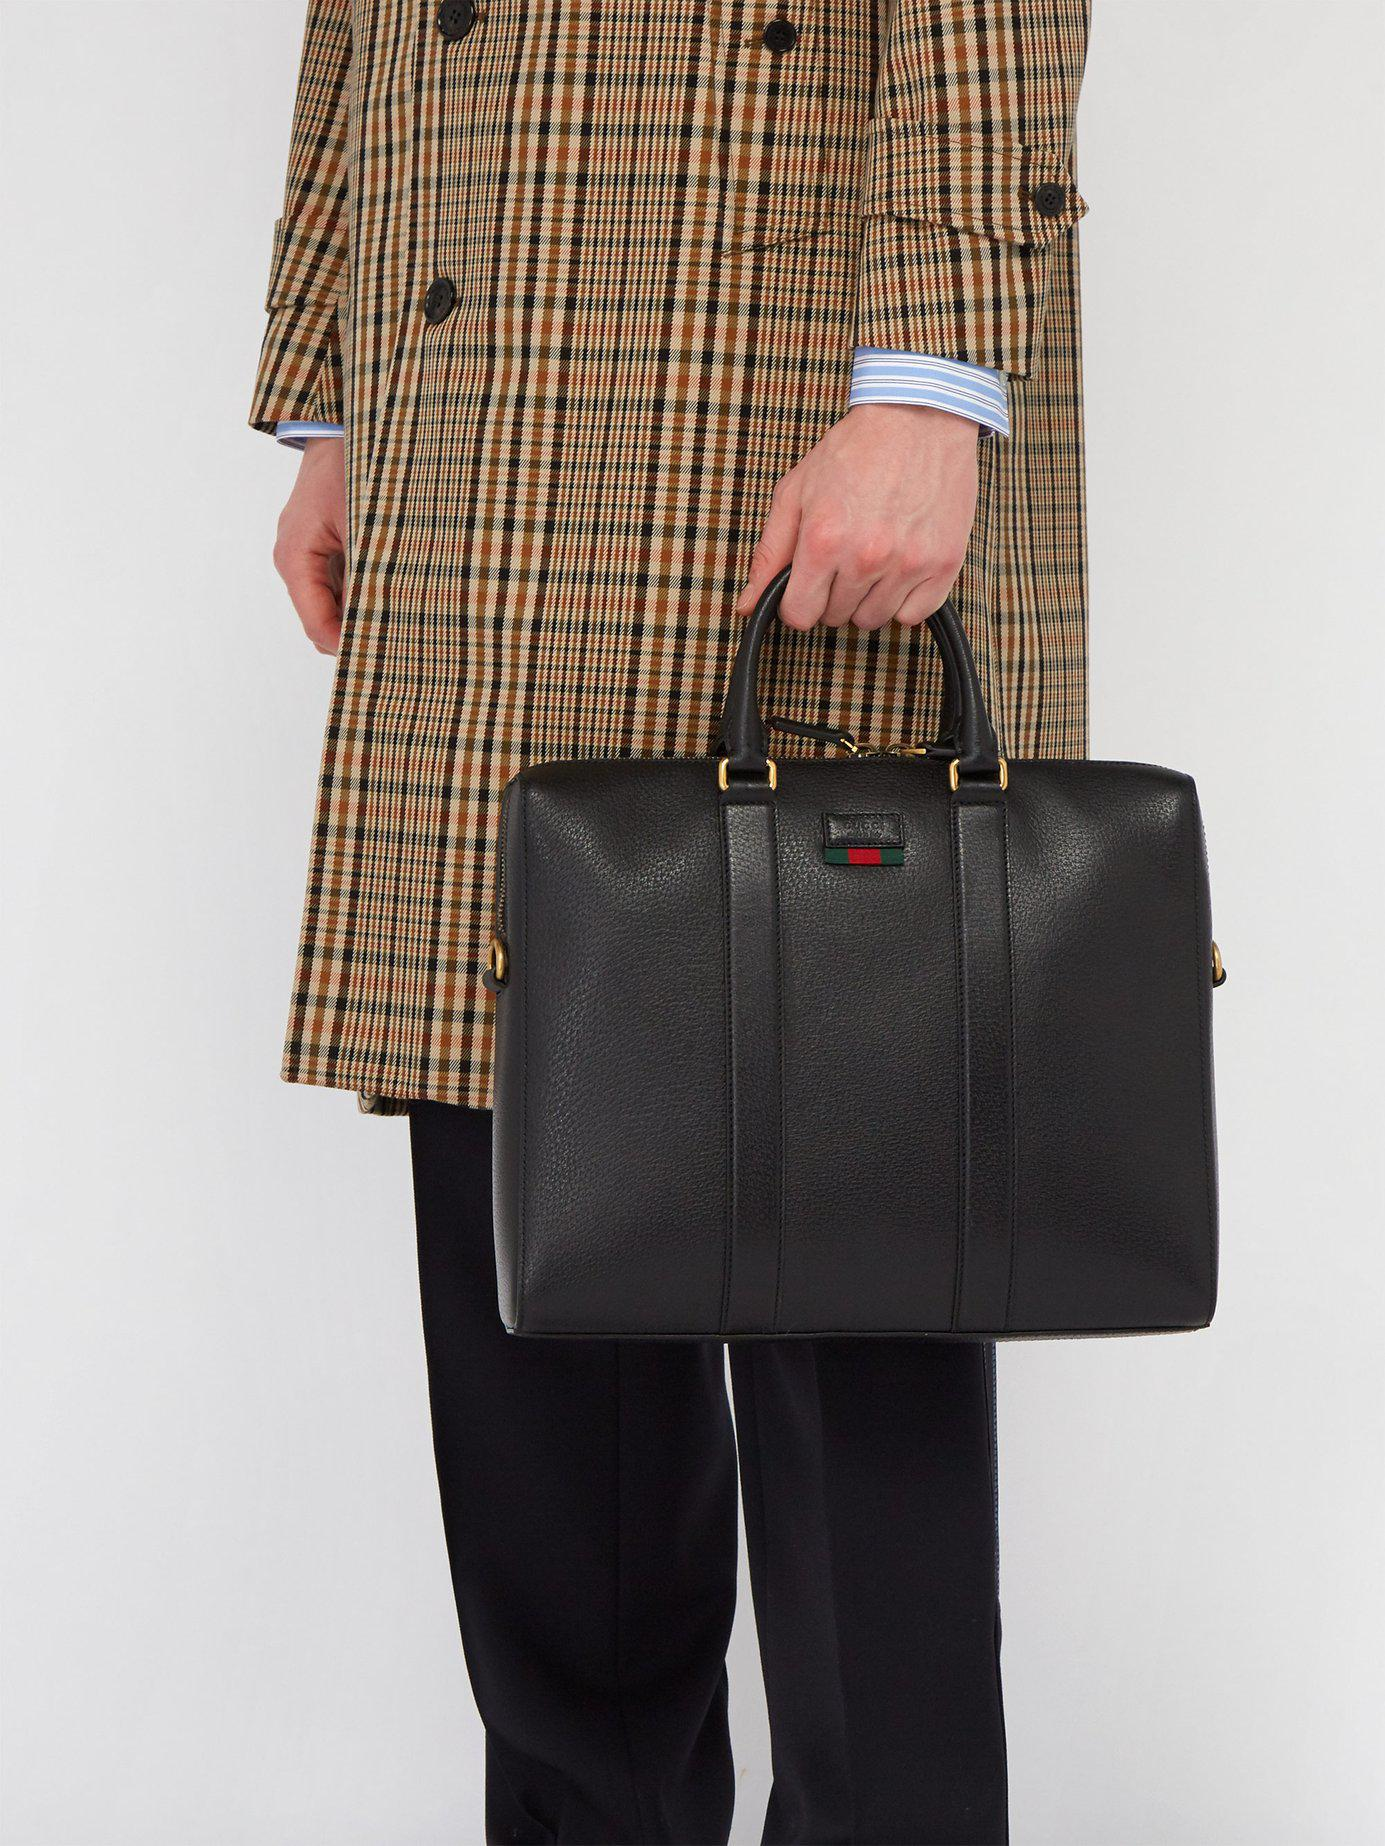 998acc2e2495 Gucci - Black Web Stripe Leather Briefcase for Men - Lyst. View fullscreen